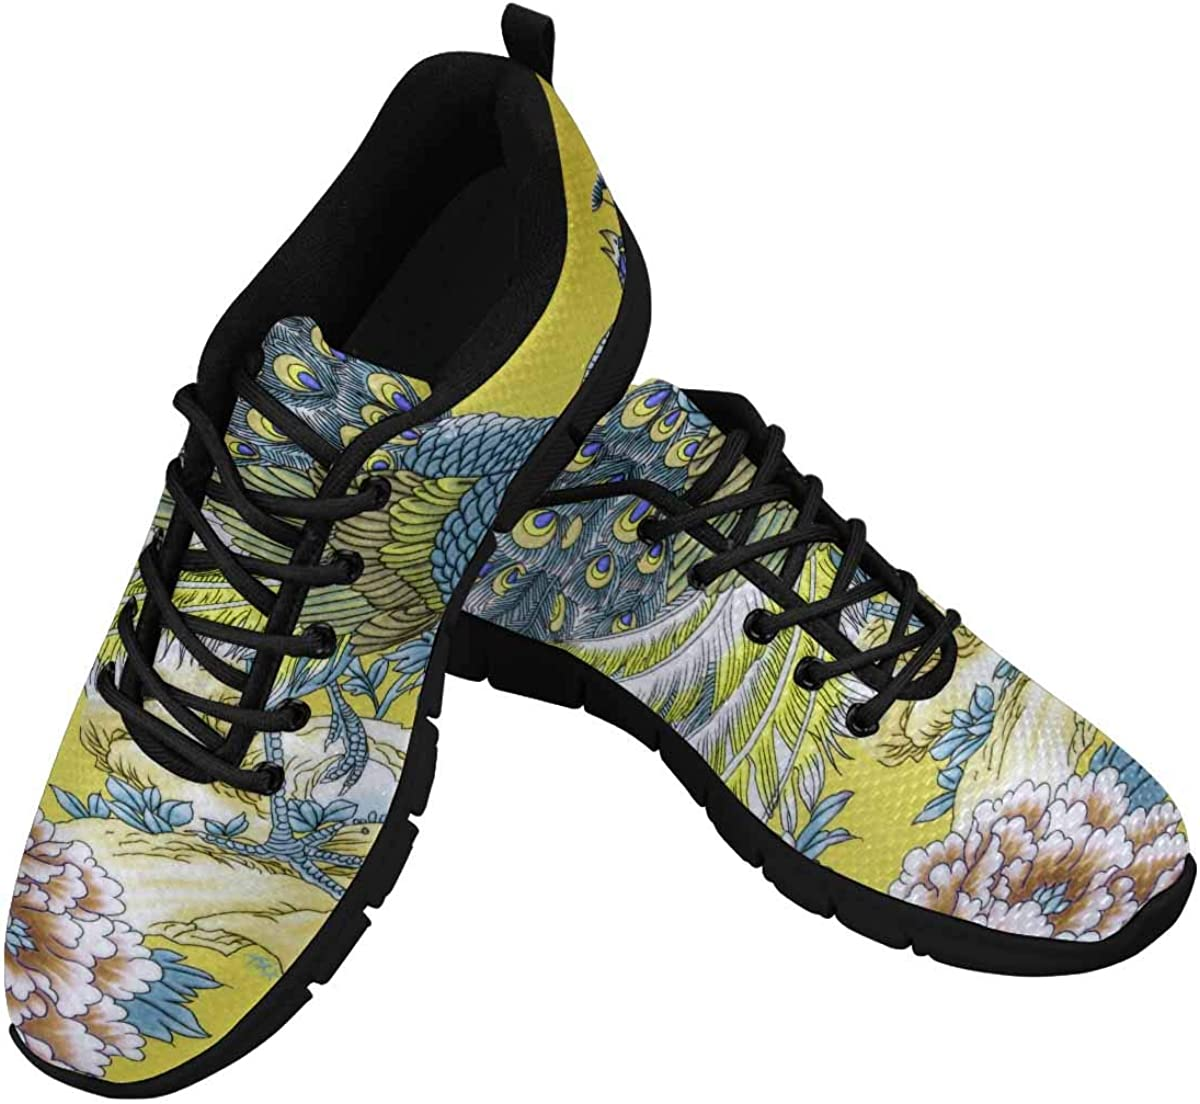 InterestPrint Beautiful Florals Peacock Women Walking Shoes Comfortable Lightweight Work Casual Travel Sneakers